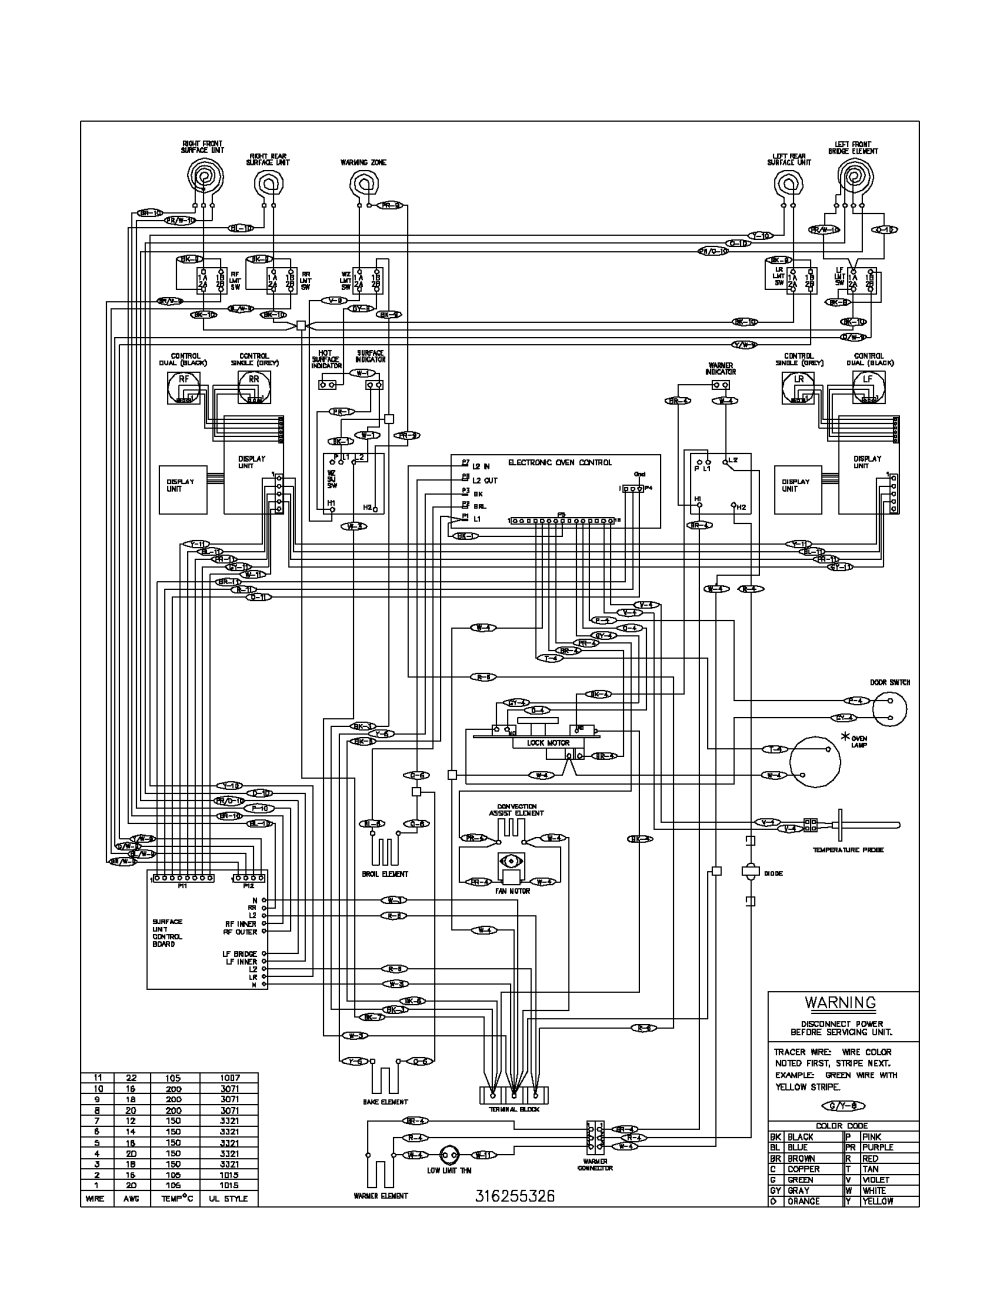 medium resolution of frigidaire oven wiring diagram wiring diagrams carrier wiring diagrams frigidaire wire diagram